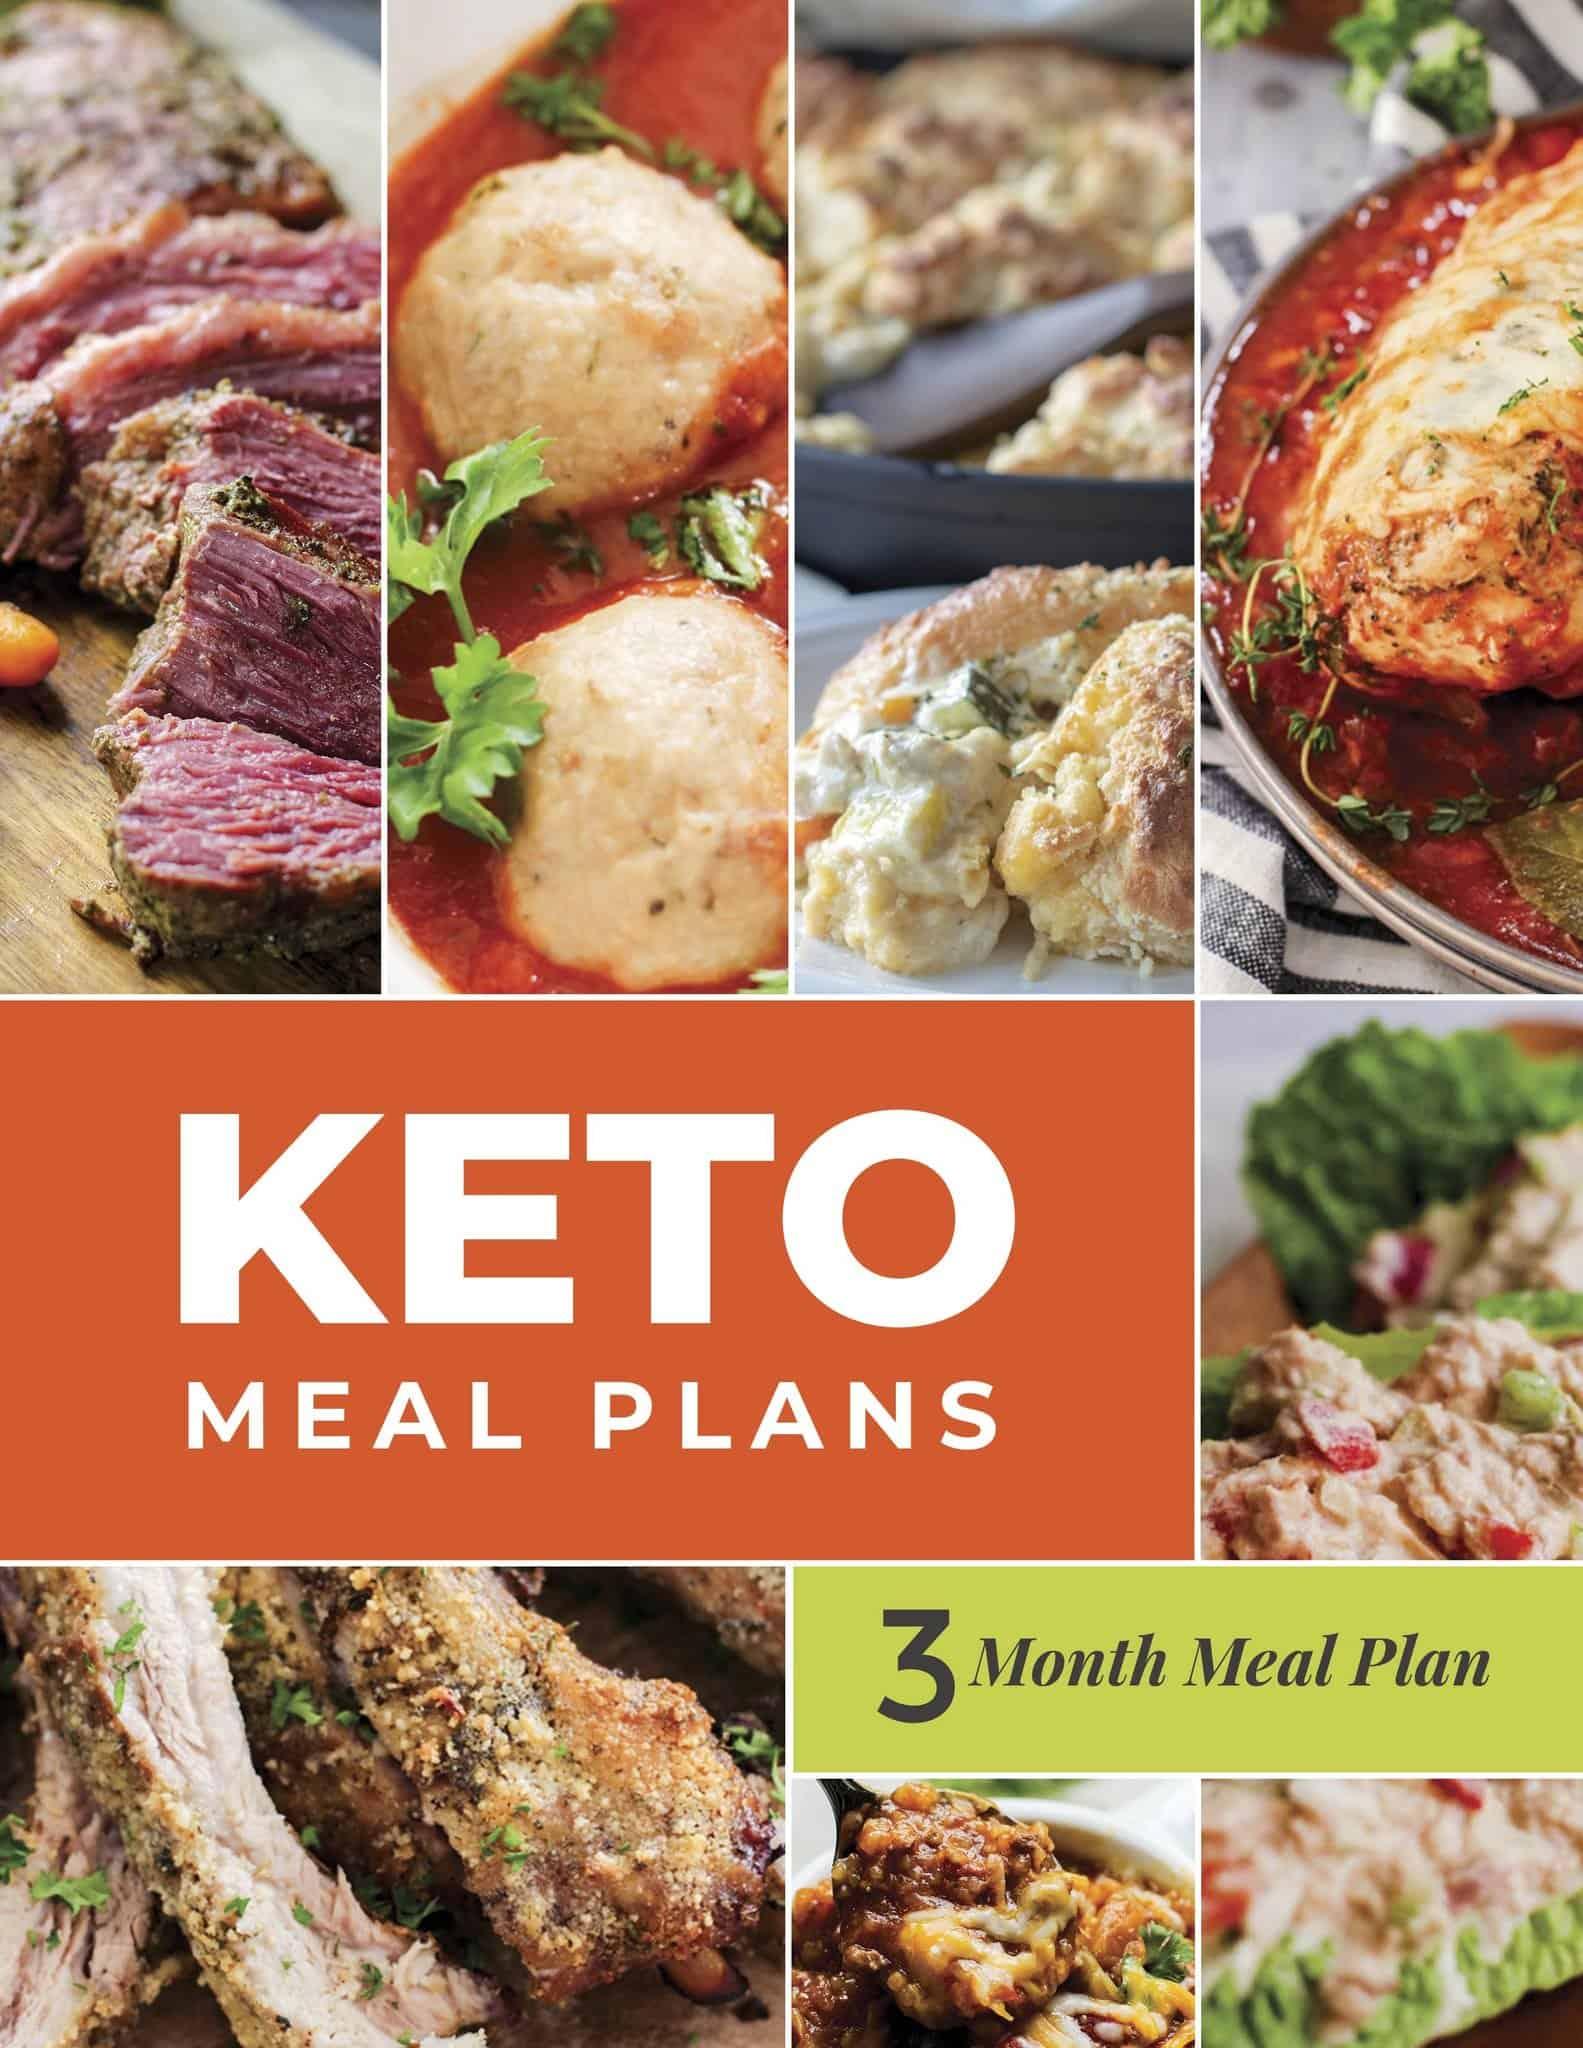 Keto meal plan 3 month printable download